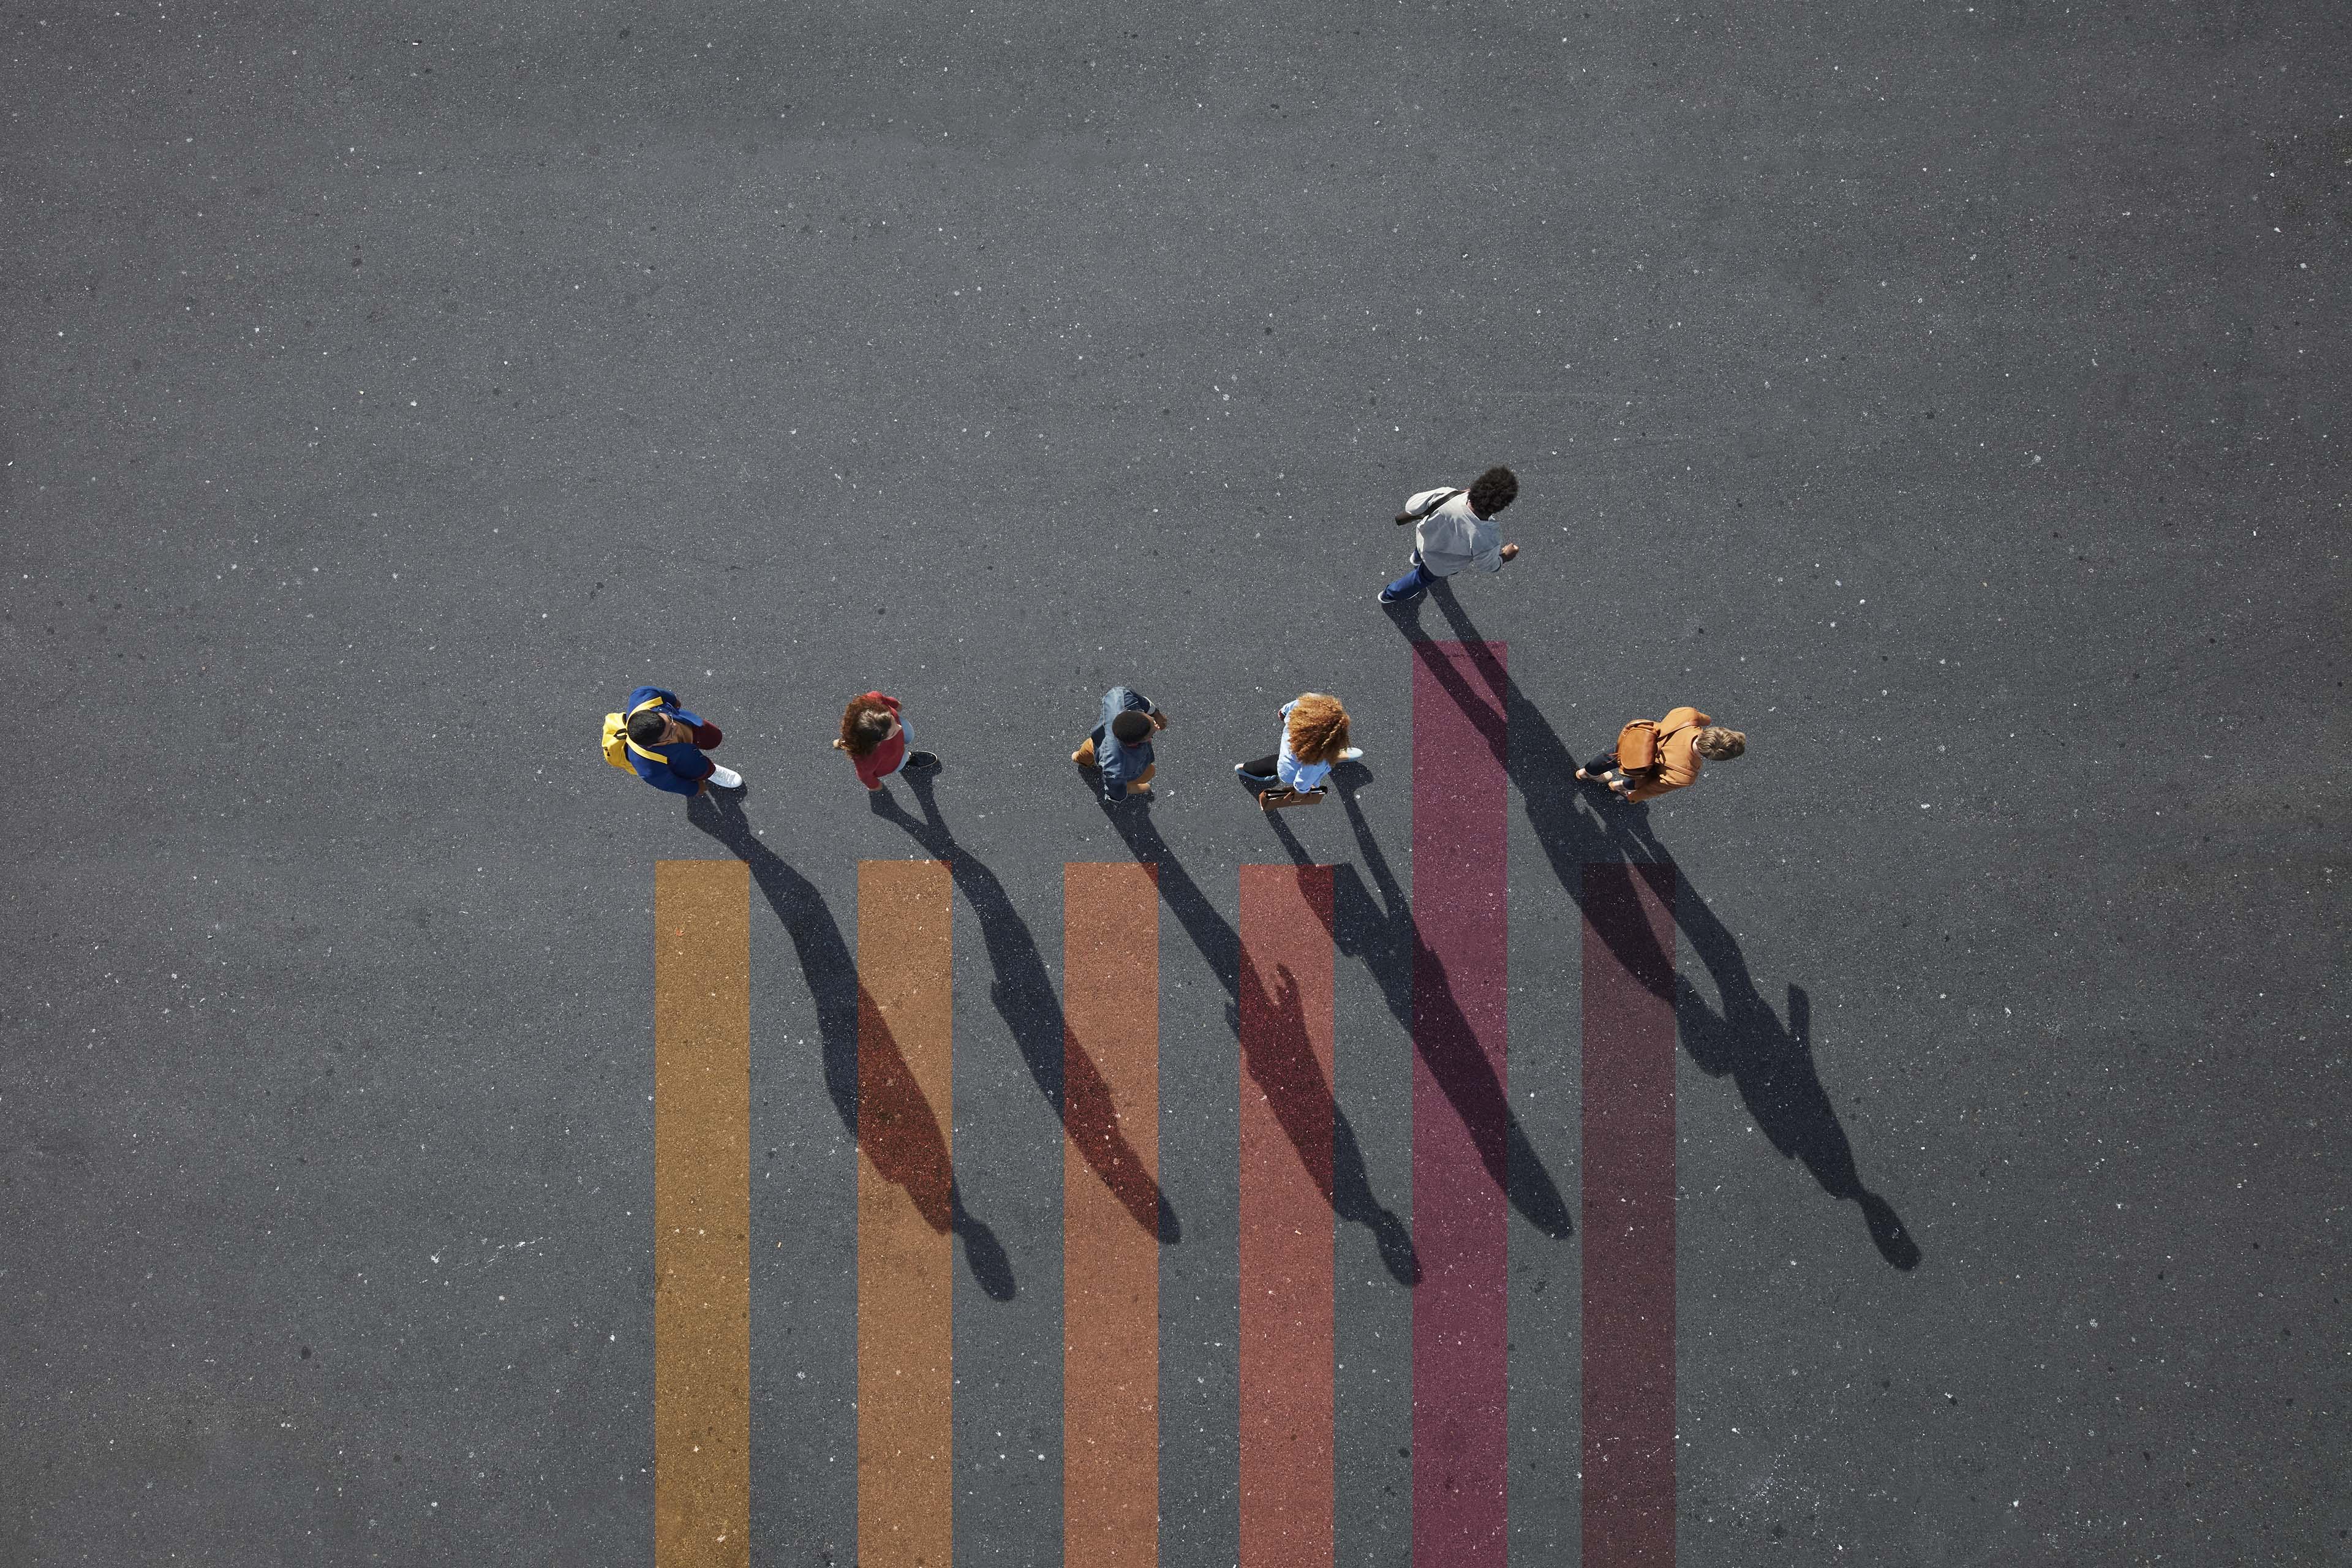 People walking on colored lines painted on asphalt